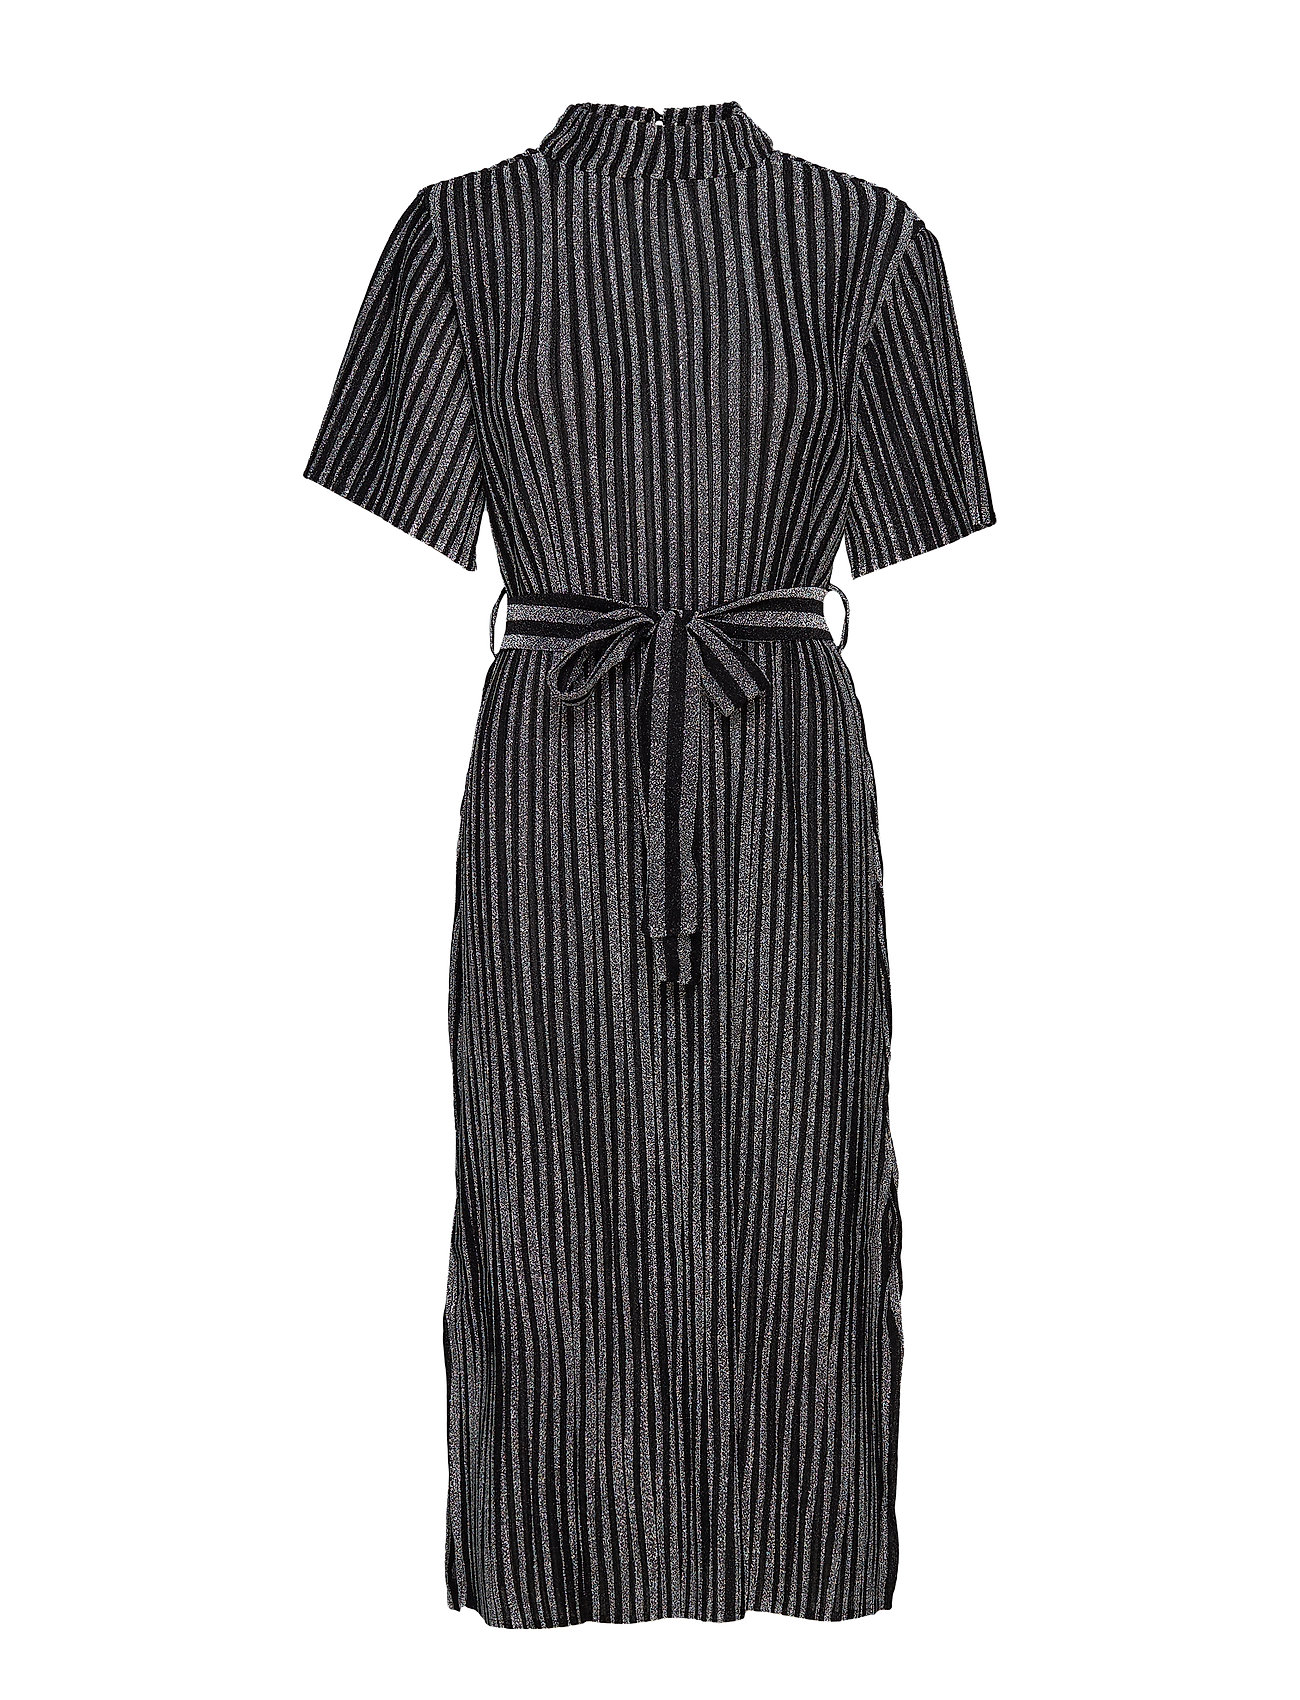 Aéryne Studio dress - NOIR ARGENT